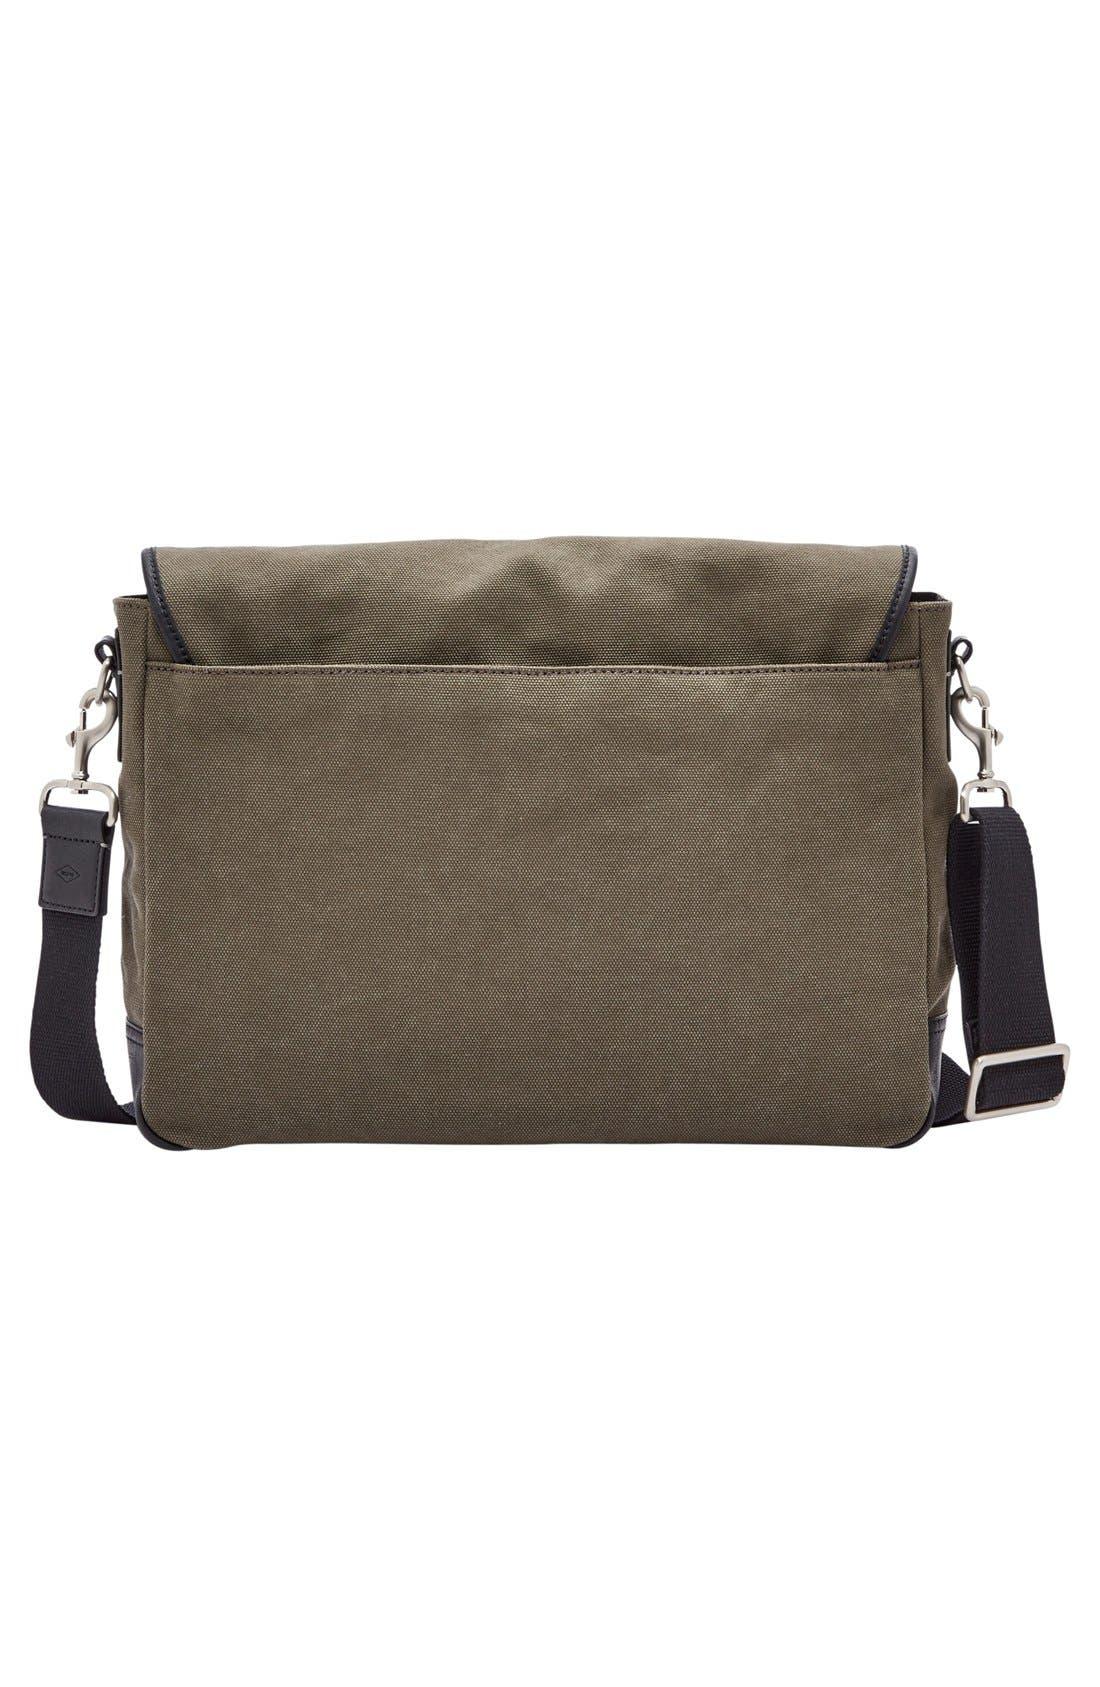 'Graham' Canvas Messenger Bag,                             Alternate thumbnail 2, color,                             Olive